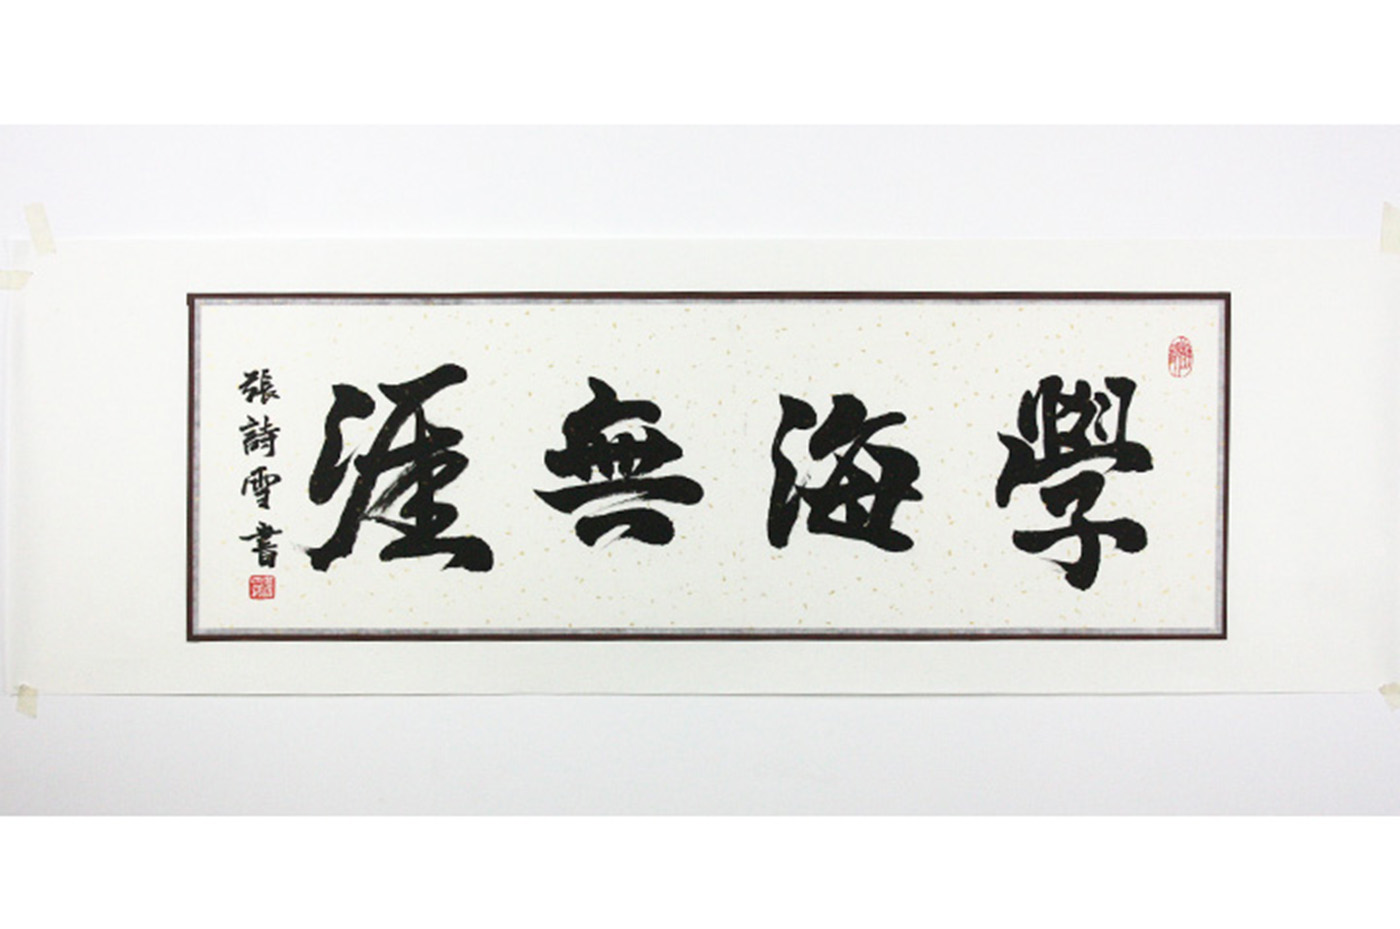 calligraphie persévérance